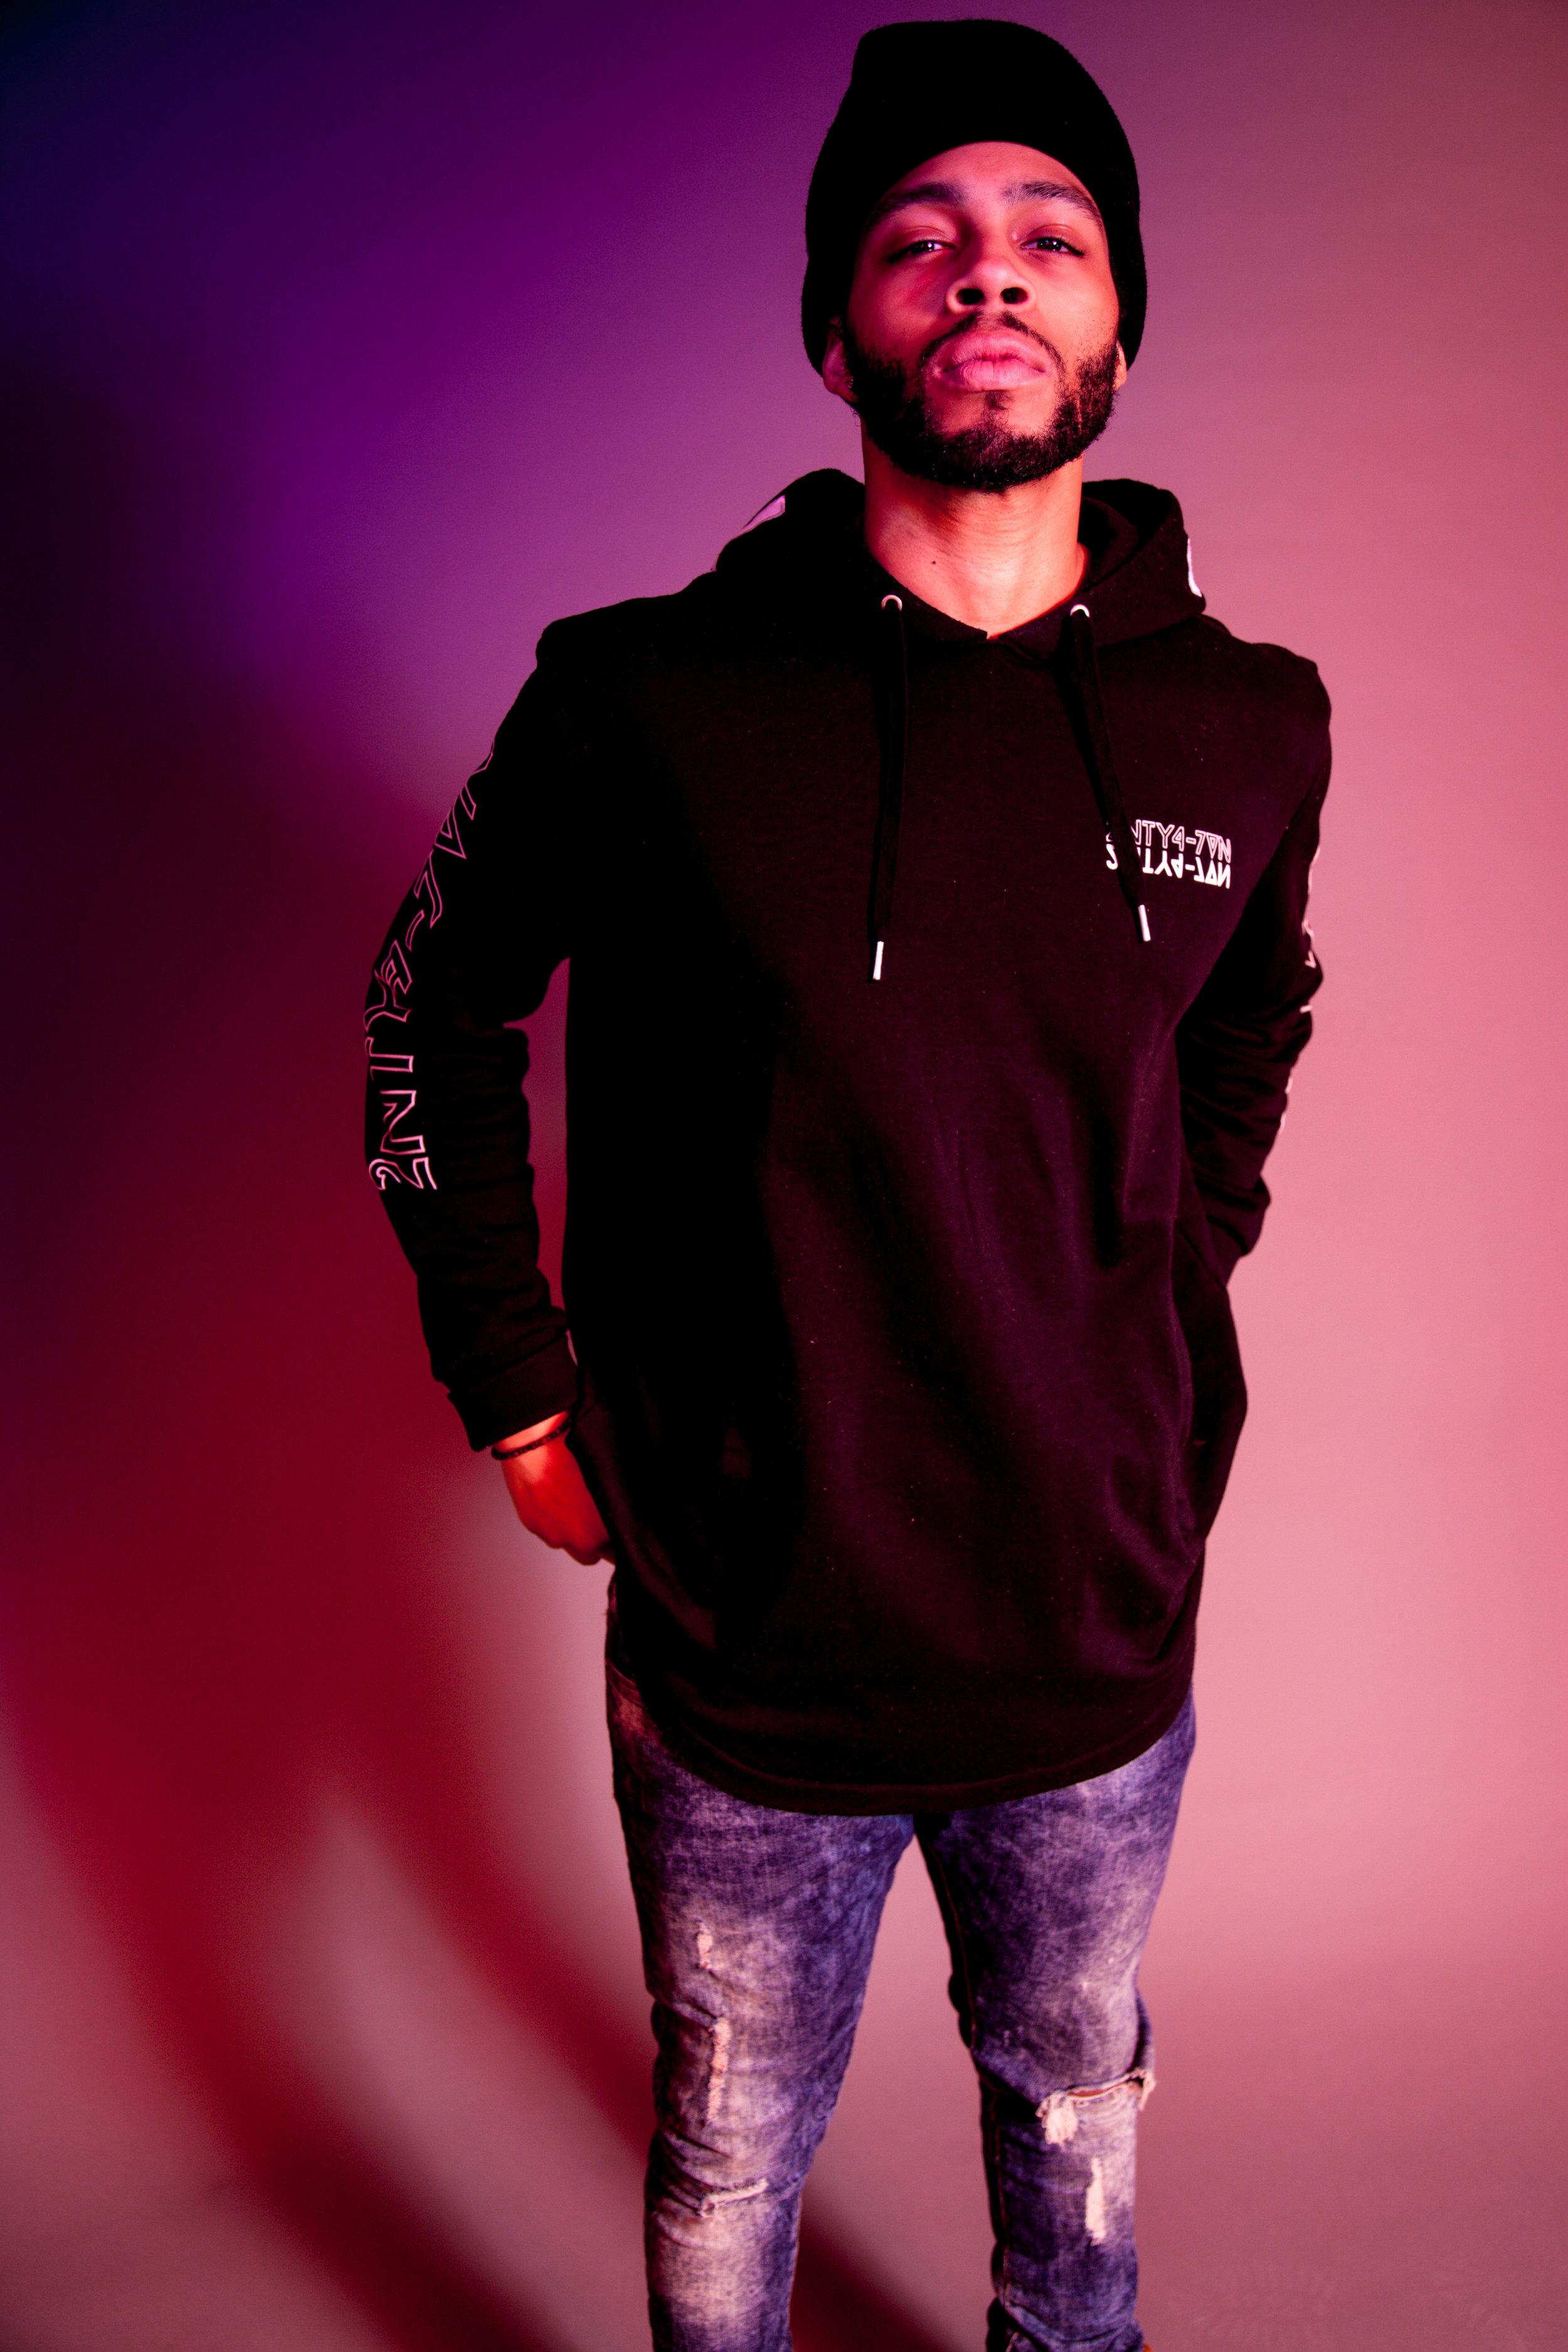 SAZE - Hip-hop, Alternative, Indie